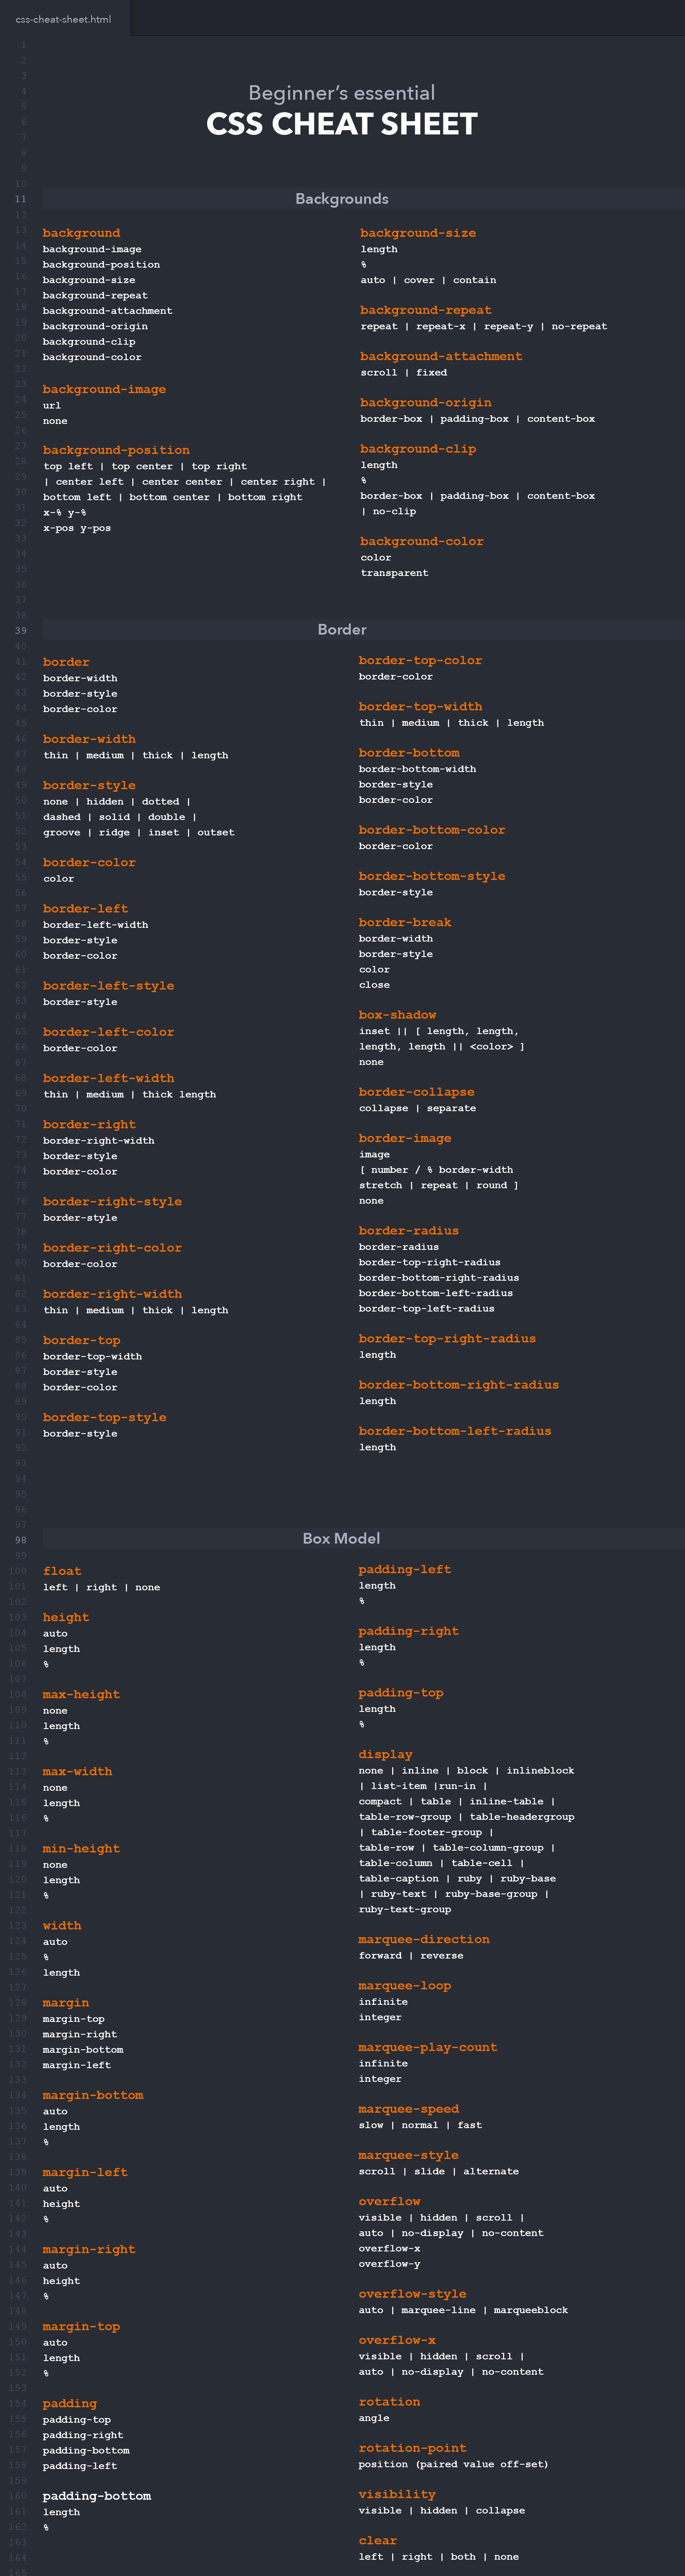 css-cheat-sheet-p1